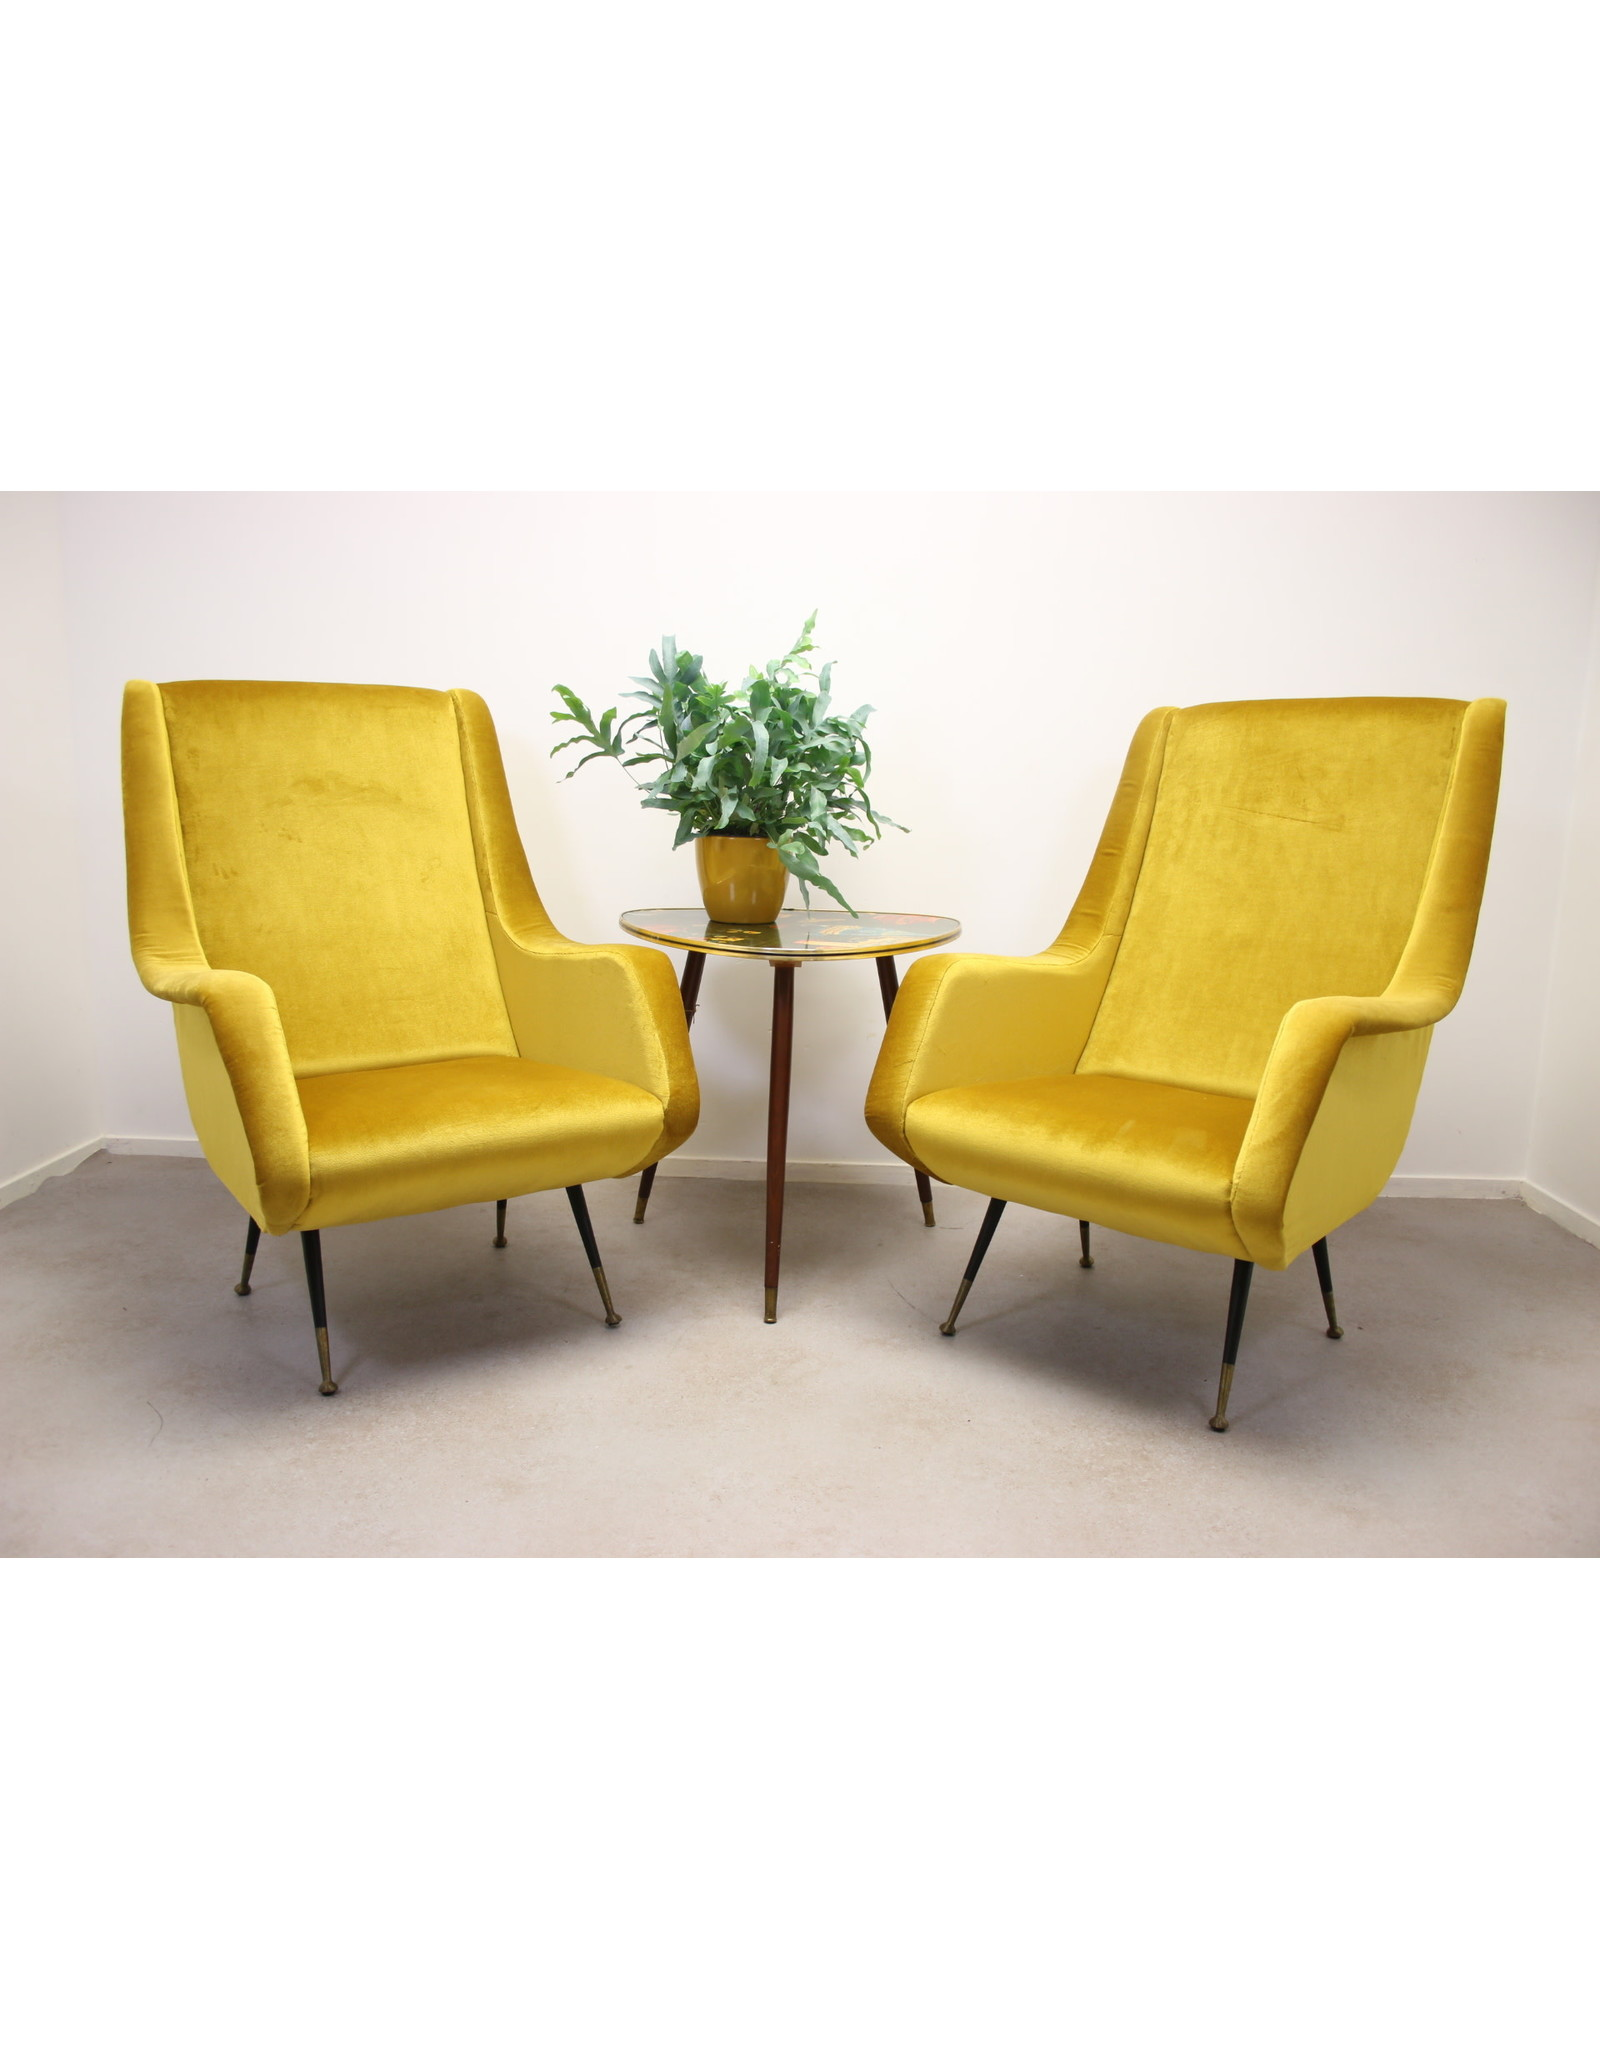 Set van 2 Lounge Chair by Aldo Morbelli for ISA Bergamo, 1950s Mais Geel